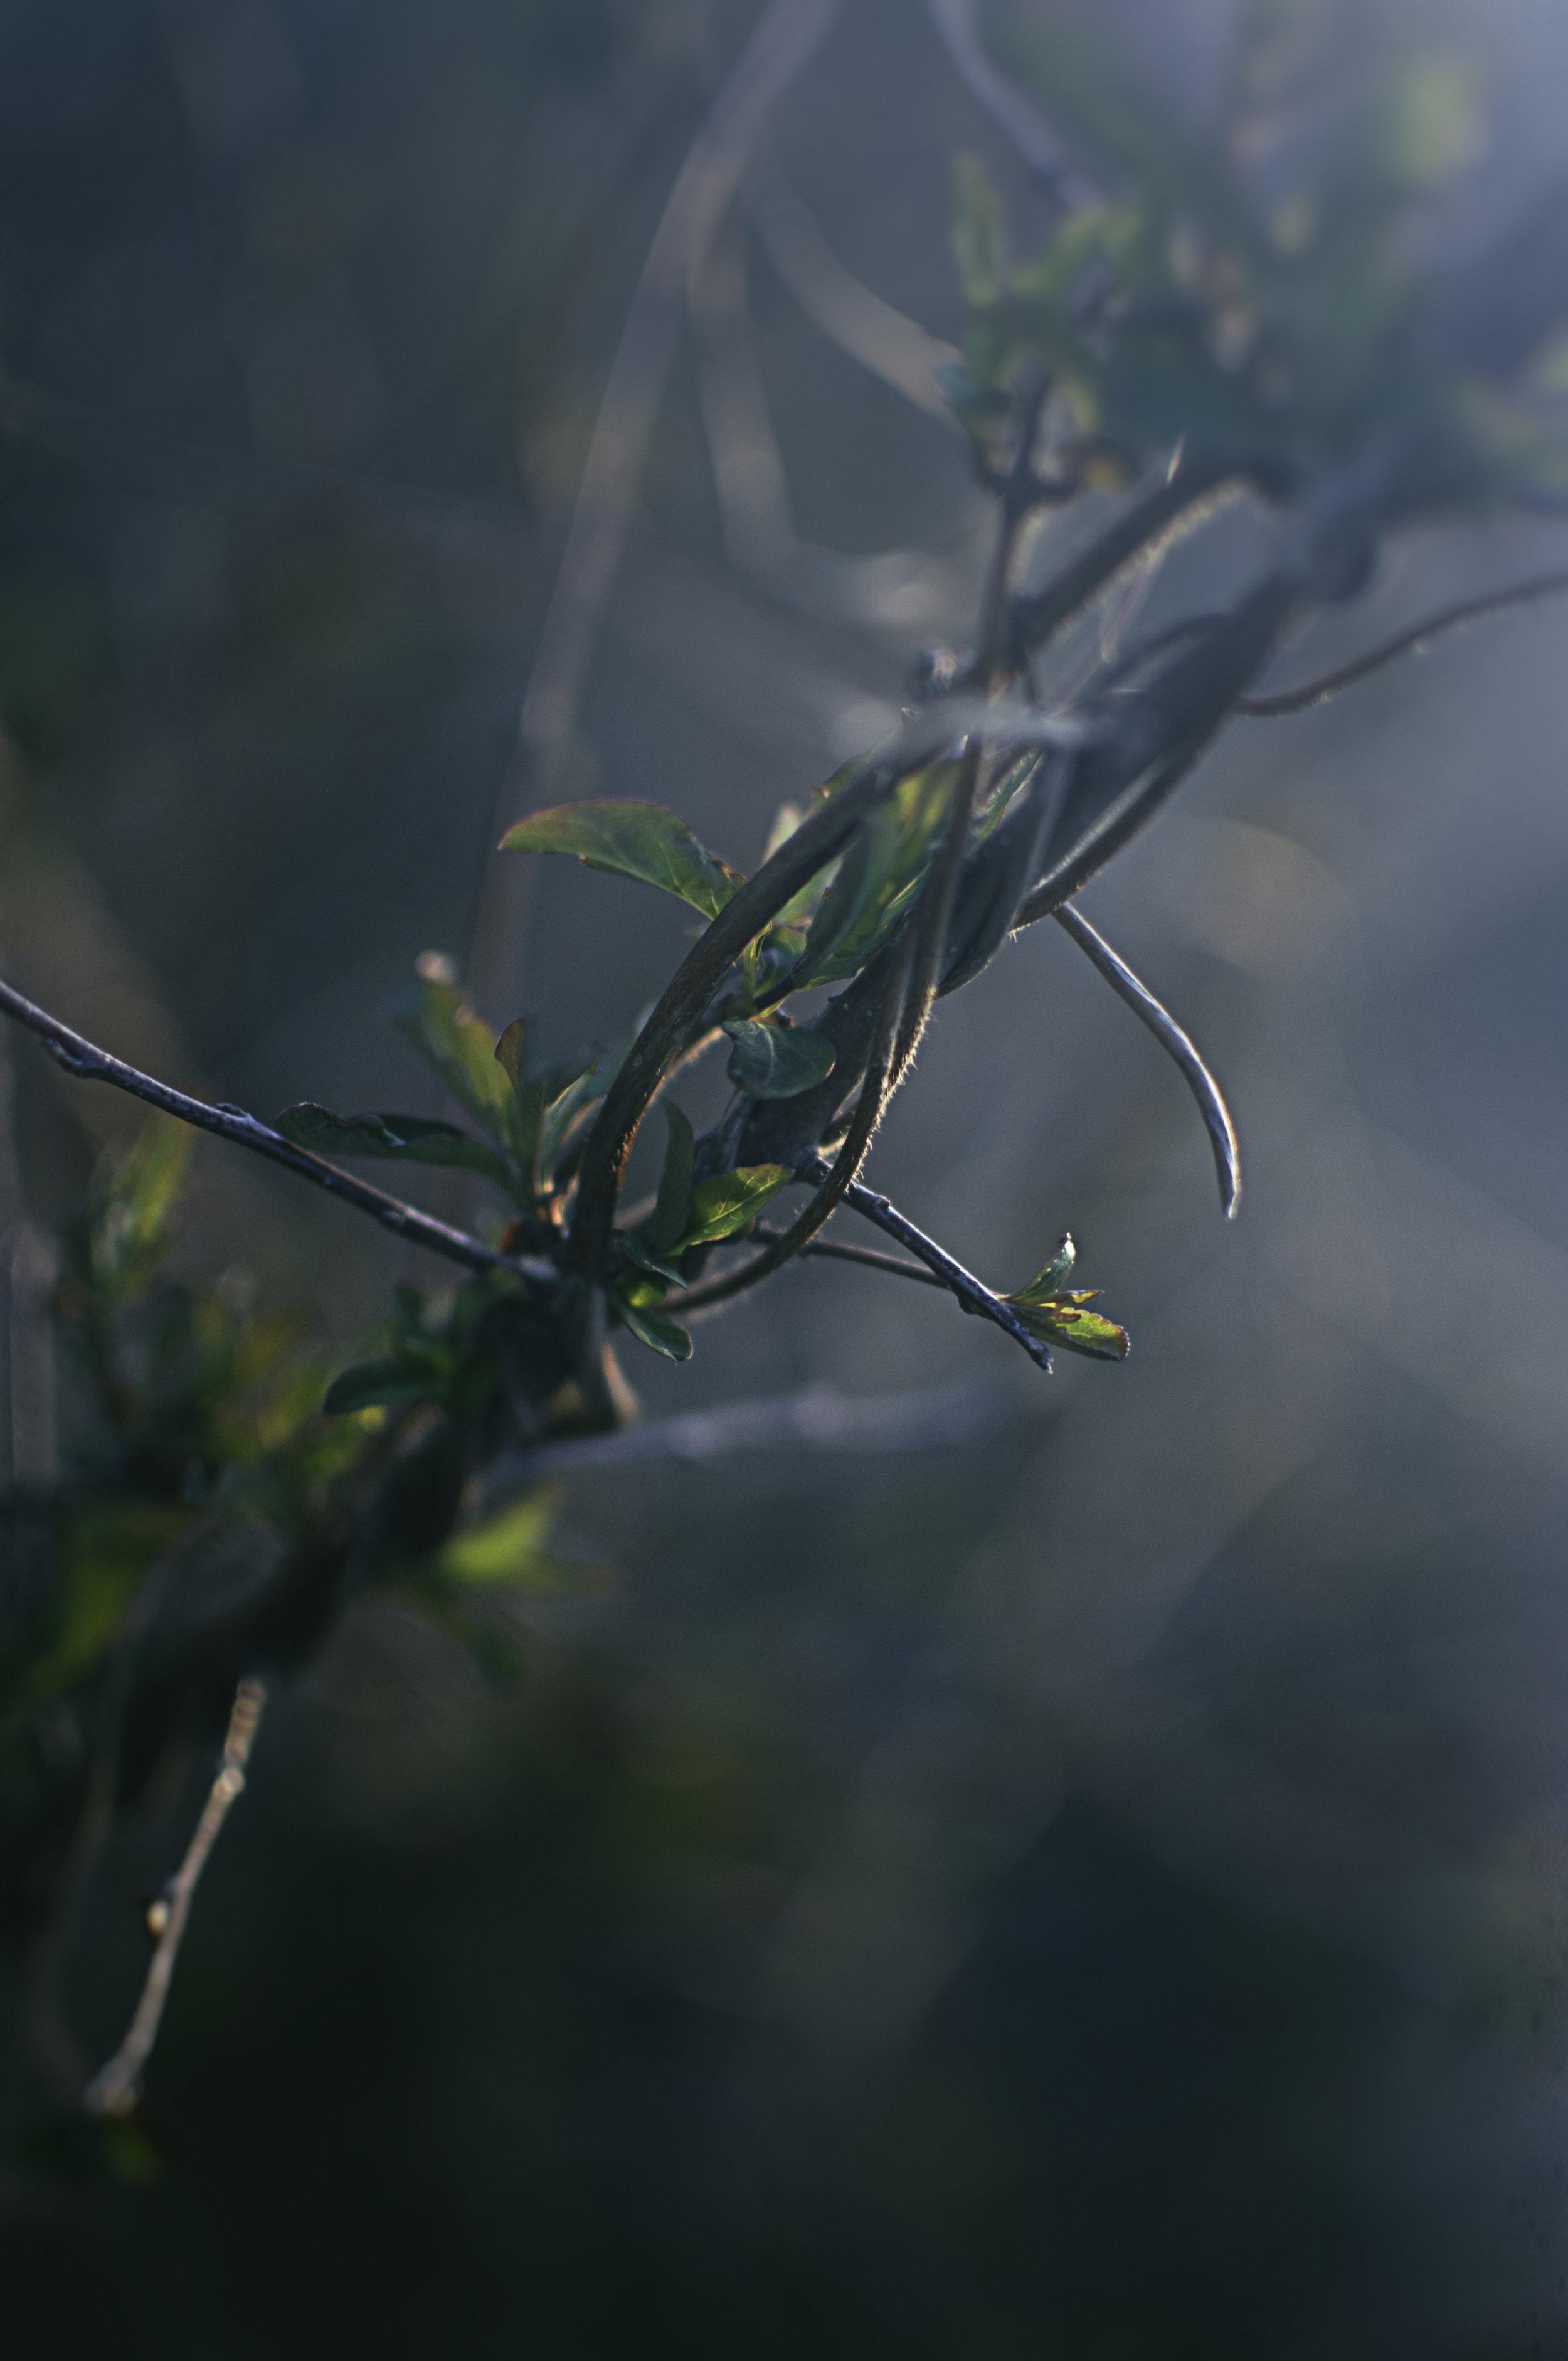 Nature_Detail_Vine001.jpg